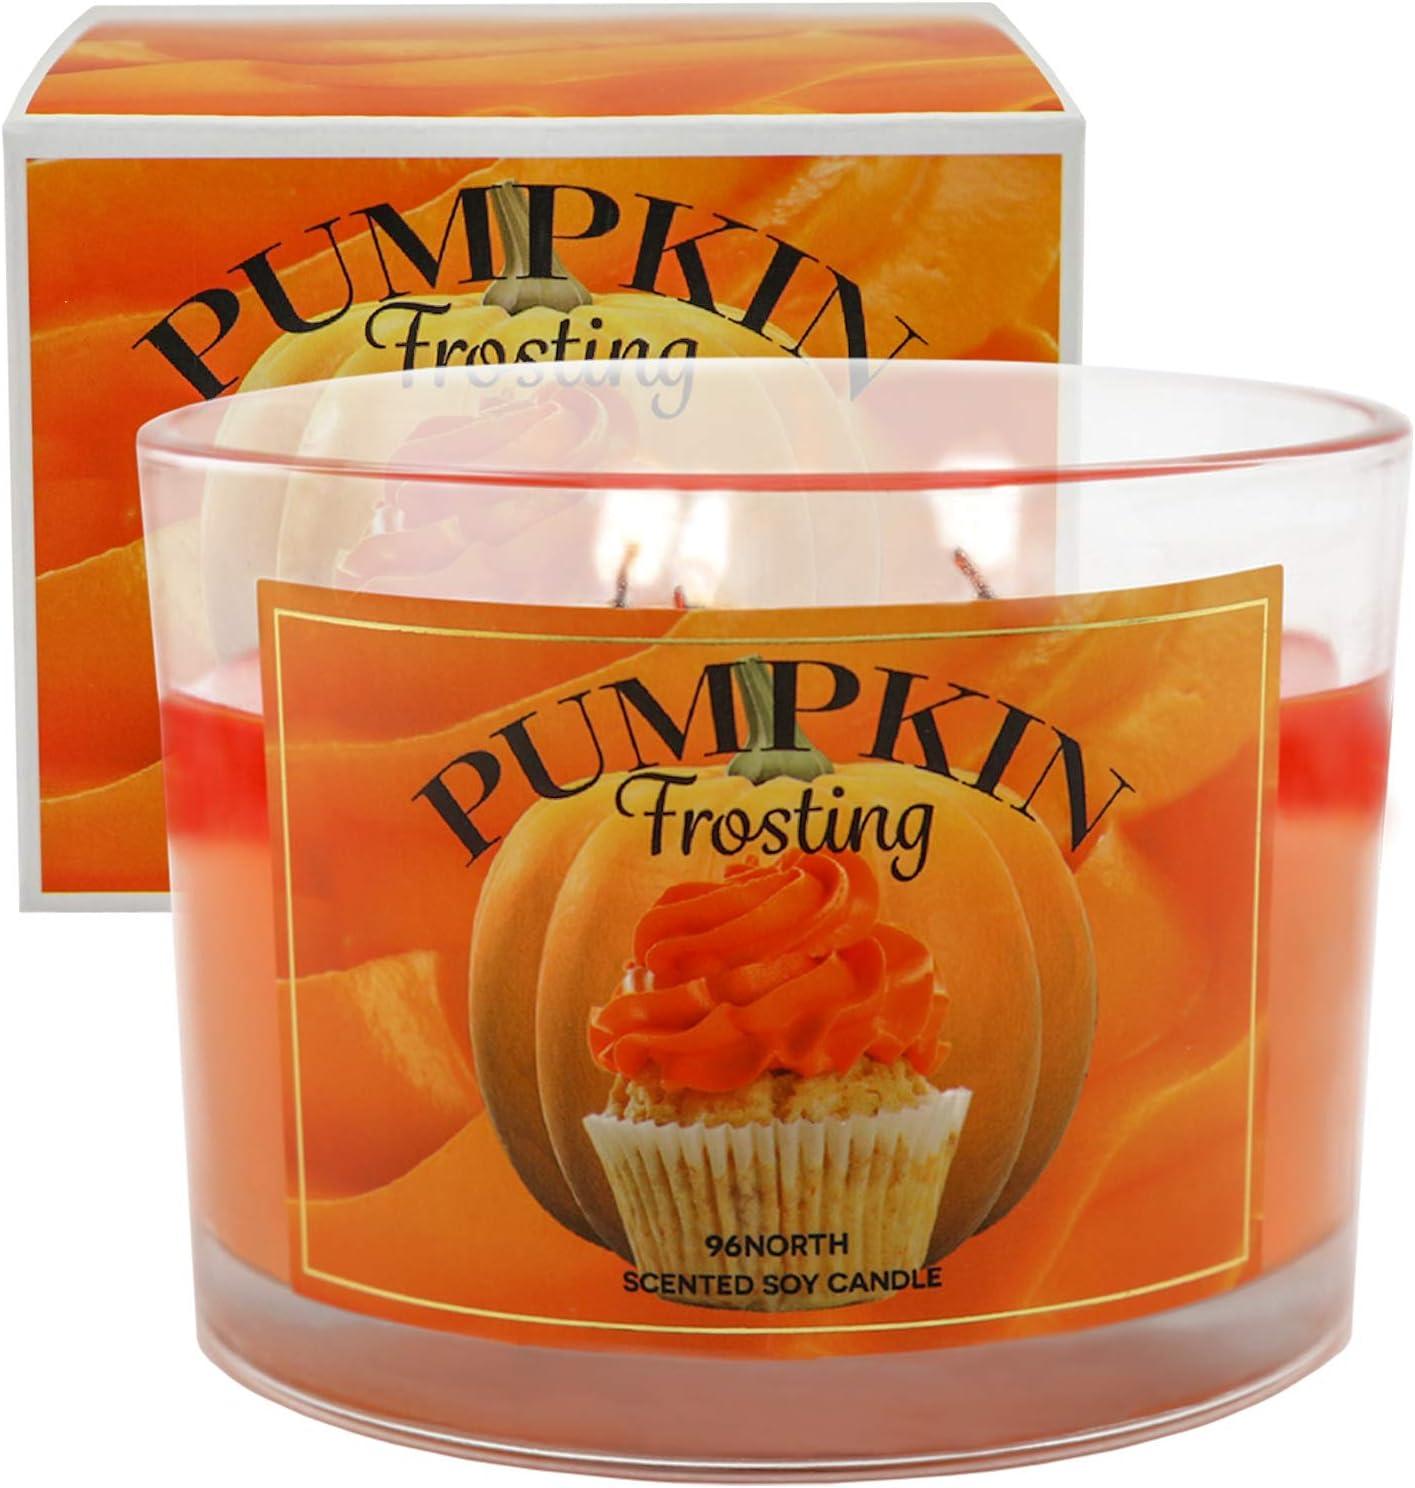 96NORTH Soy 3-Wick Pumpkin Candles, Pumpkin Spice Candles, Fall Candles // Pumpkin Spice Candles for Home, Pumpkin Scented Candles, Pumpkin Soy Candle, Fall Scented Candle, Candles for Home Scented